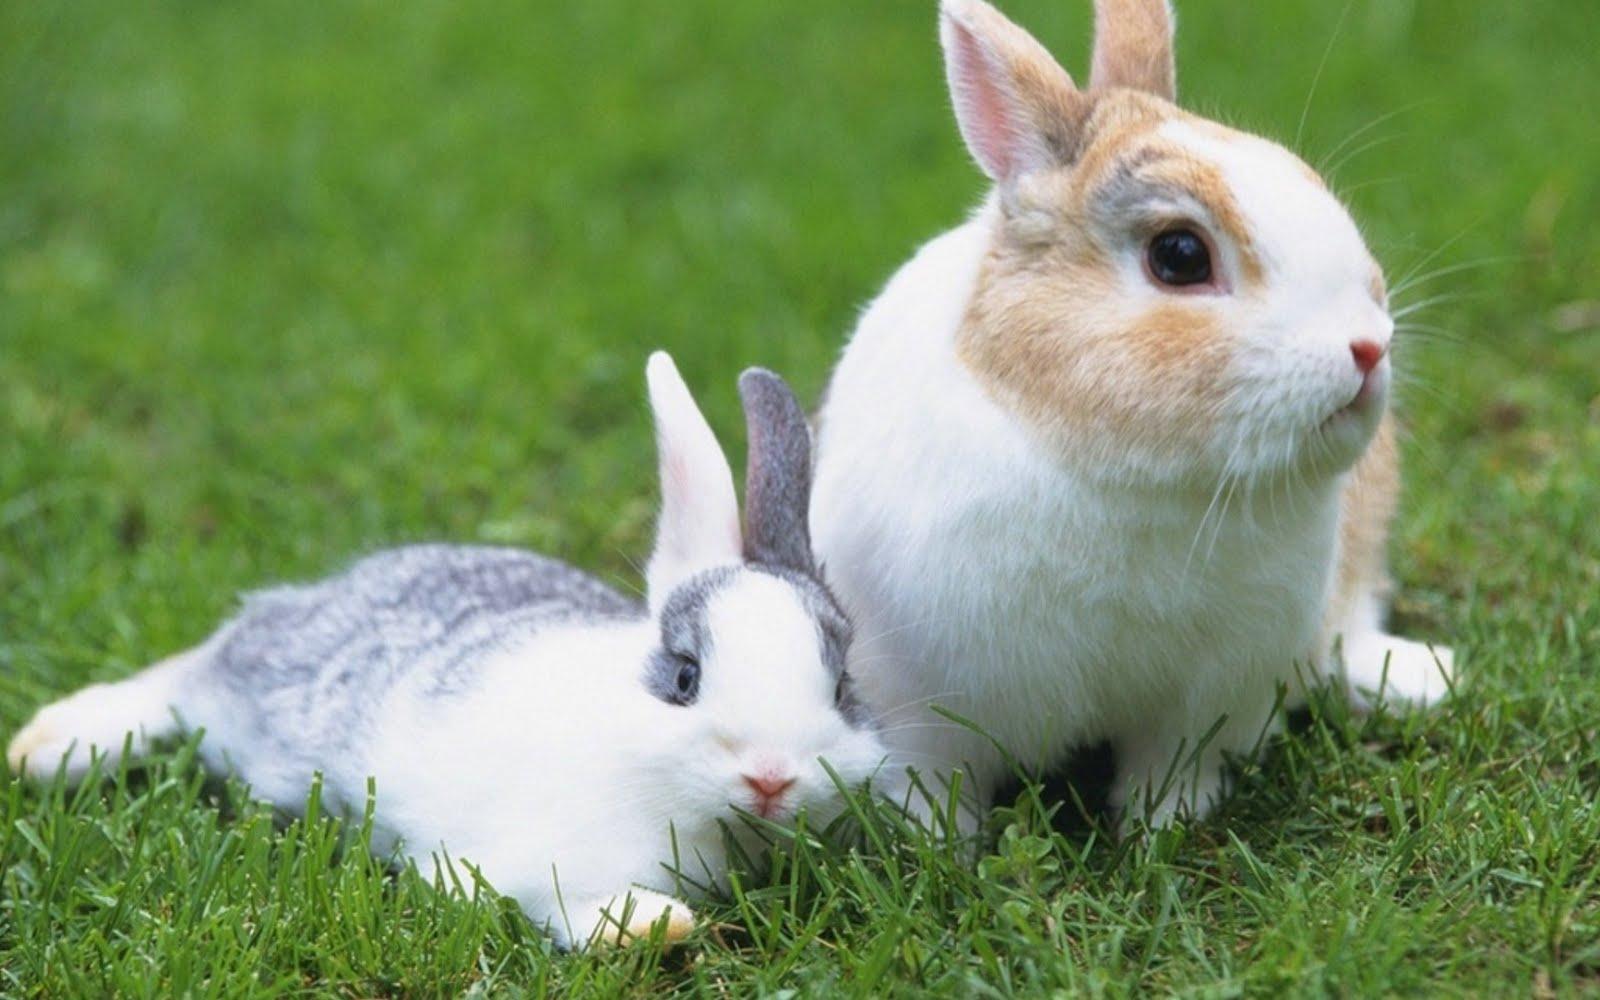 https://2.bp.blogspot.com/-KmX7DRuyoBE/TahWWujWryI/AAAAAAAACm4/F1aBJA5PnXg/s1600/Rabbit+%25284%2529.jpg